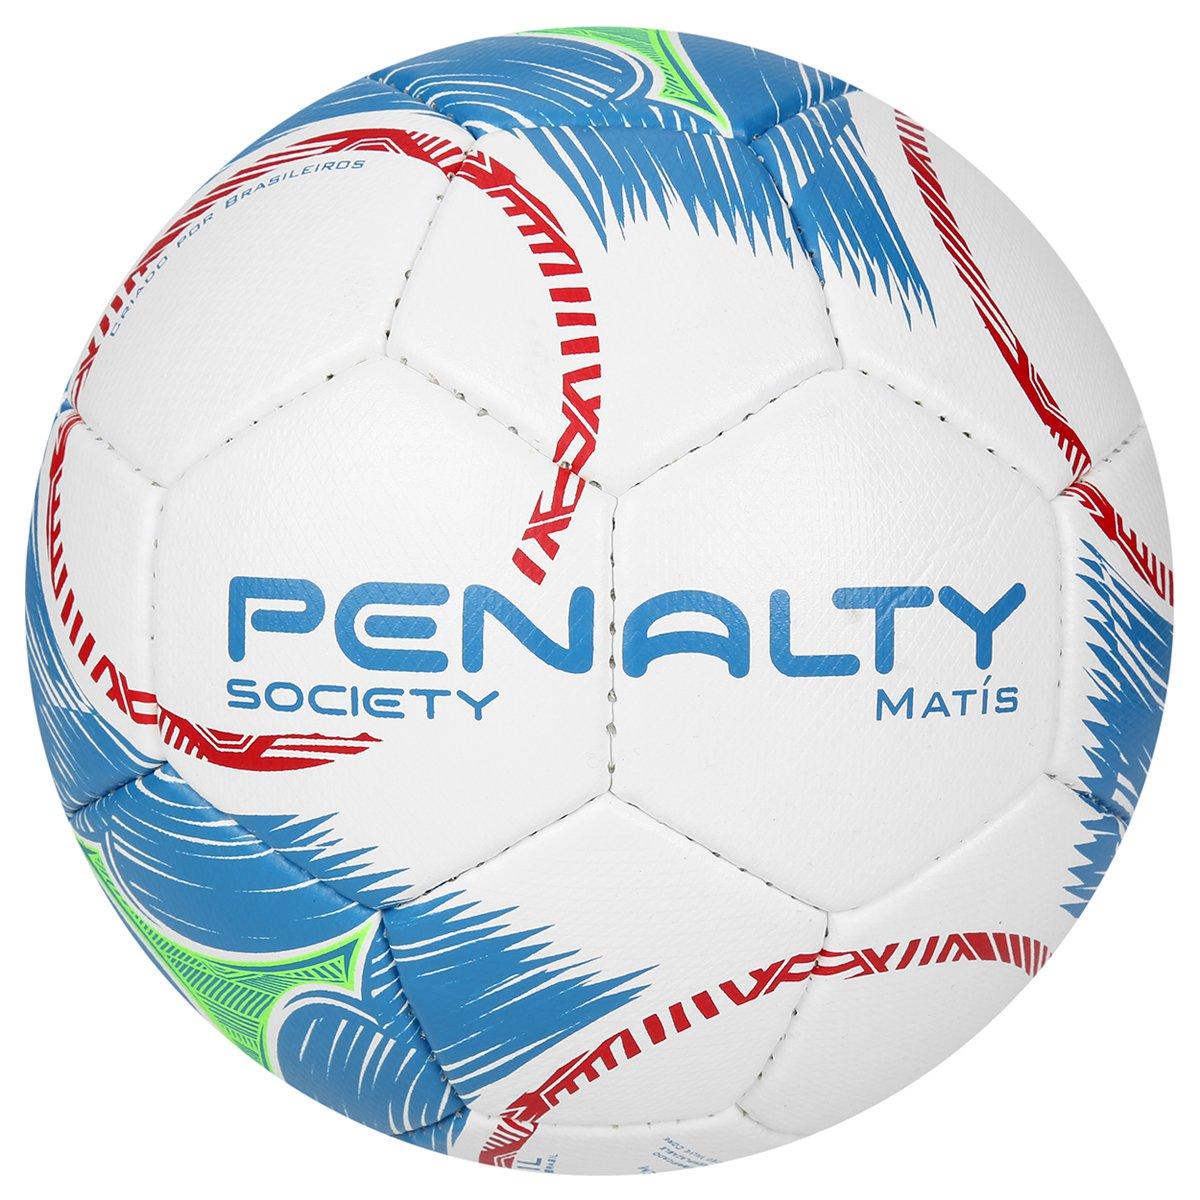 b300ebdd1a54b Bola Futebol Society Penalty Matis 6 - Compre Agora